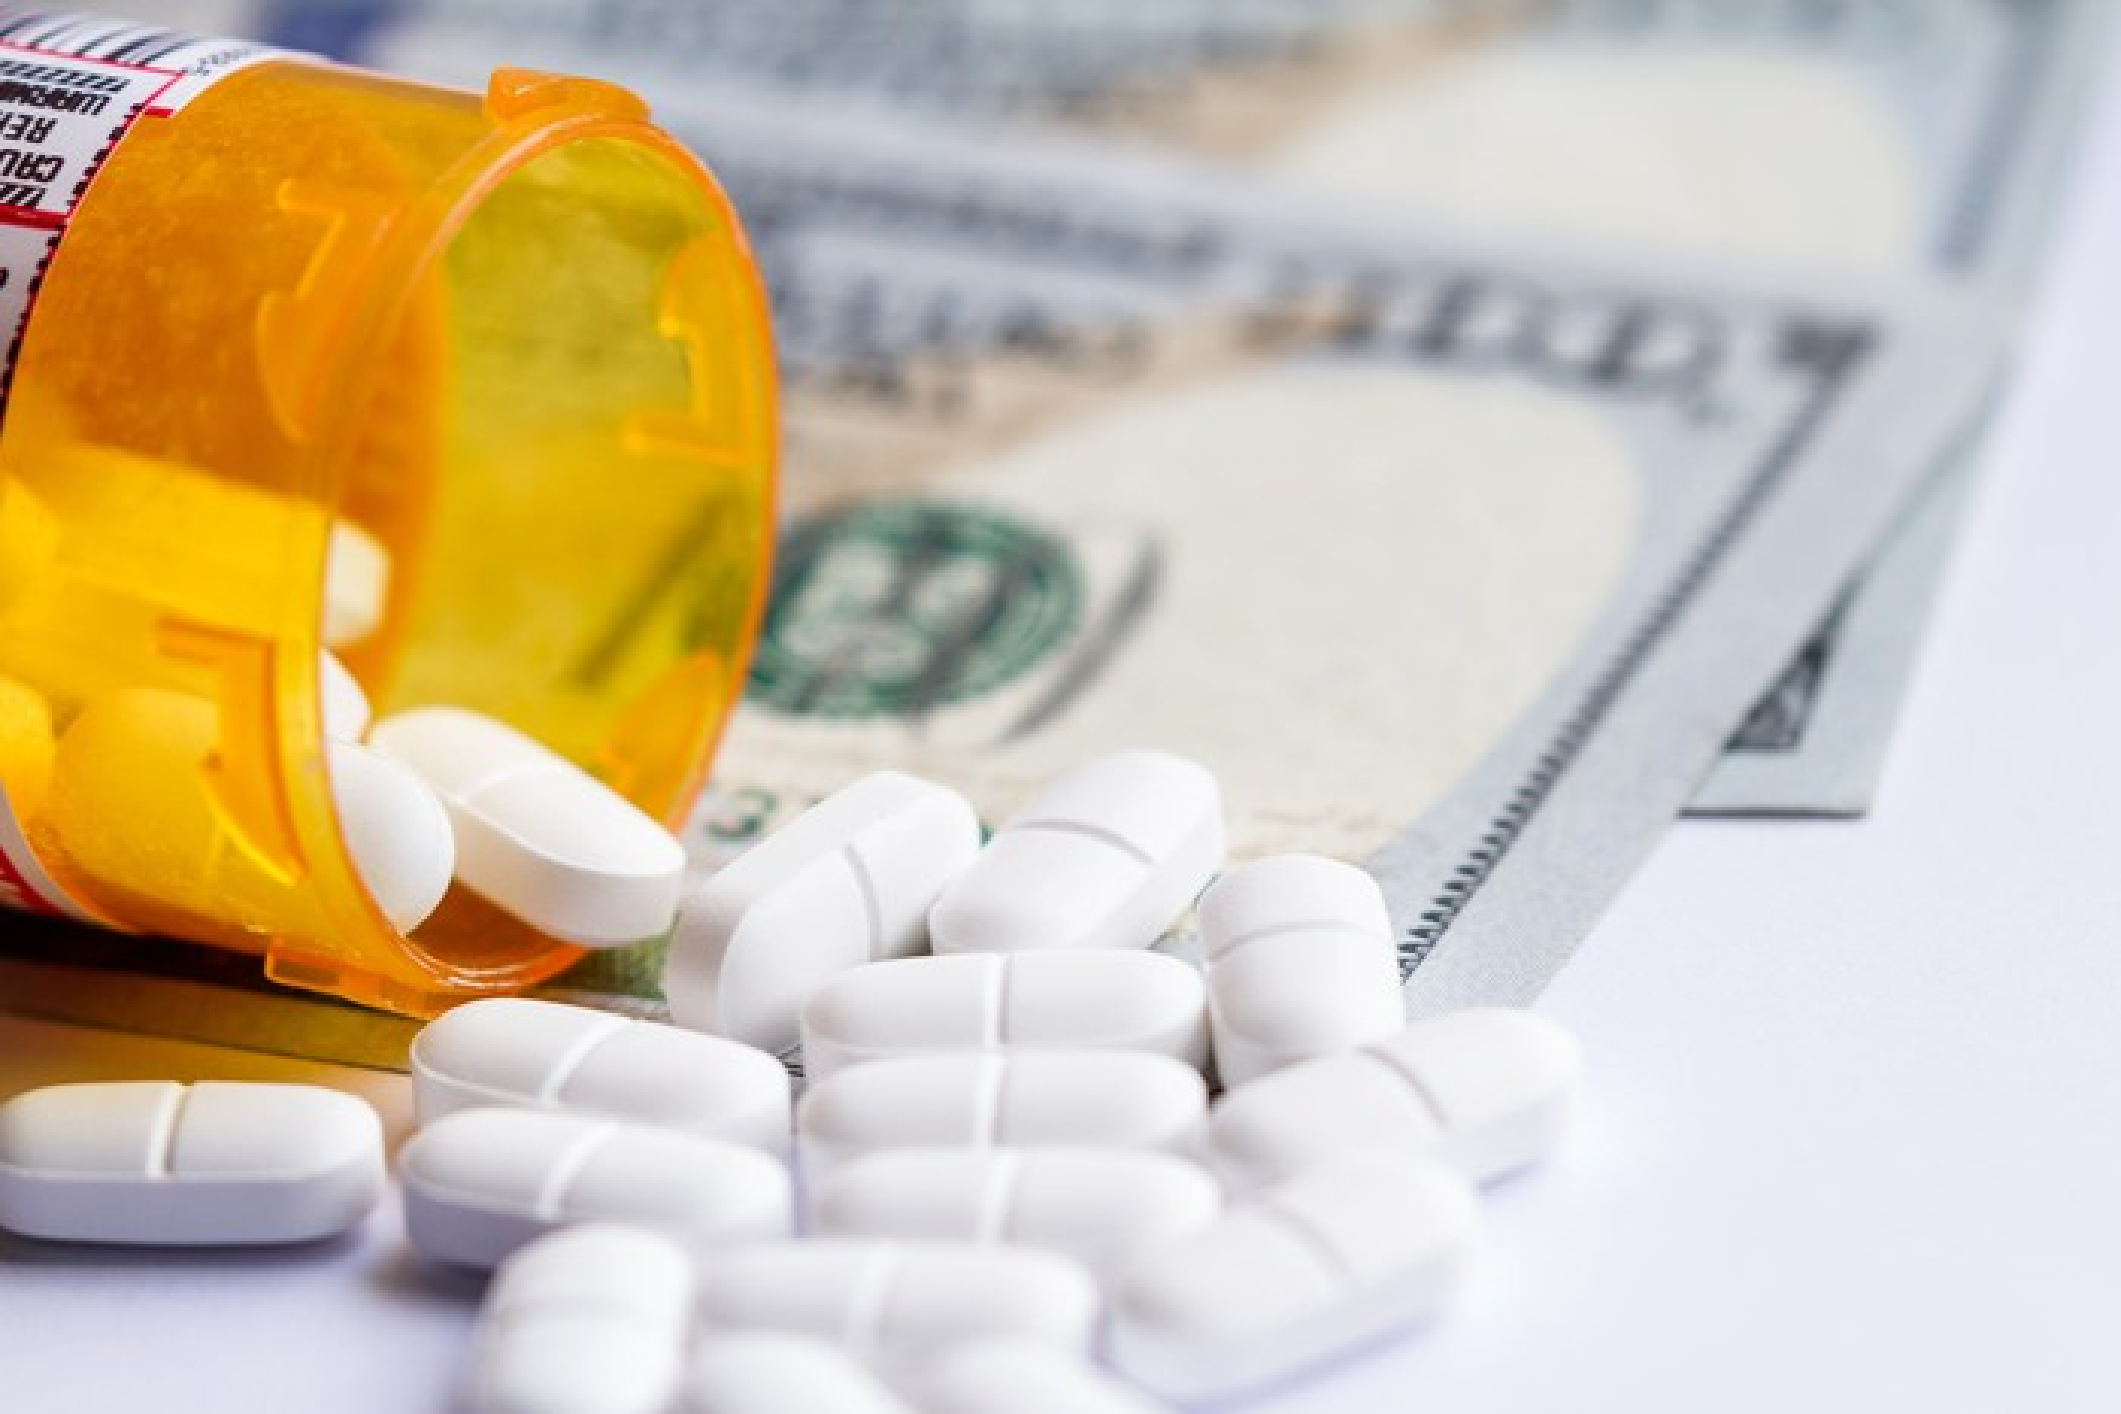 Prescription pills on top of money.